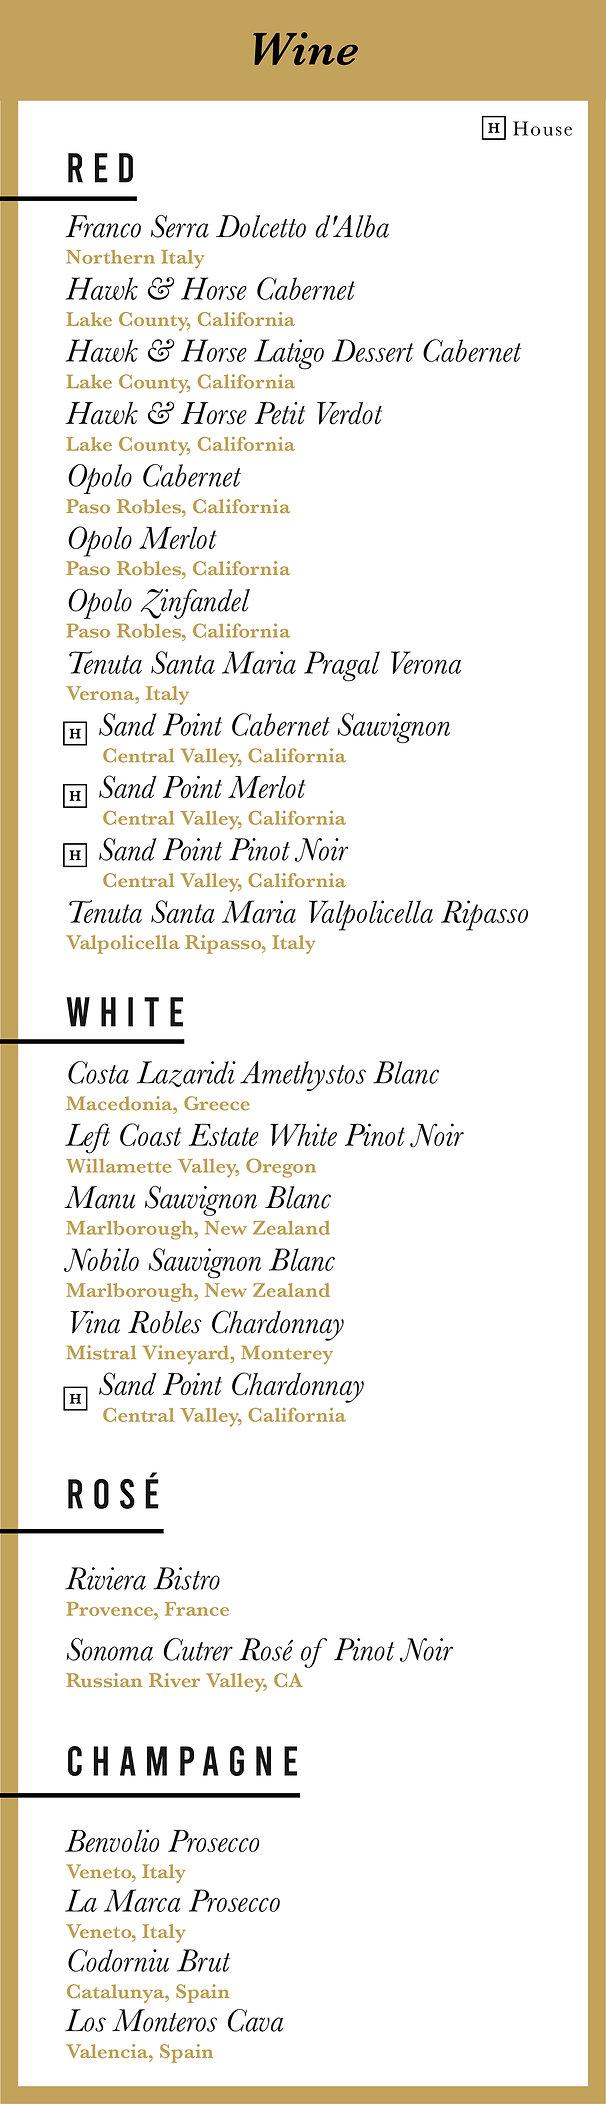 CC_menu_June_Wine.jpg